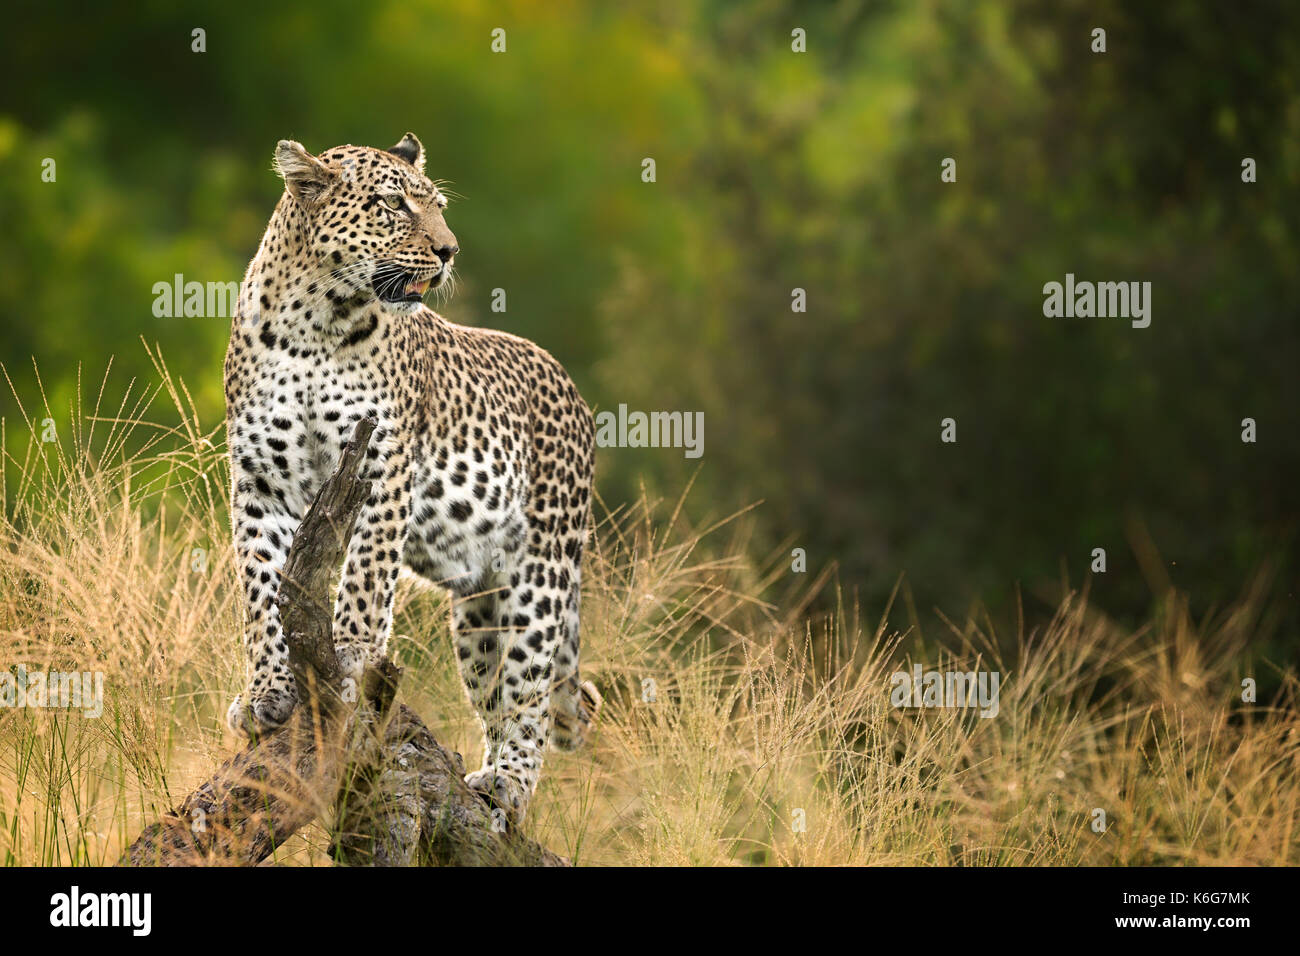 Matsebe, female leopard, (Panthera pardus) standing on treestump in Kwai, Okavango delta, Botswana - Stock Image